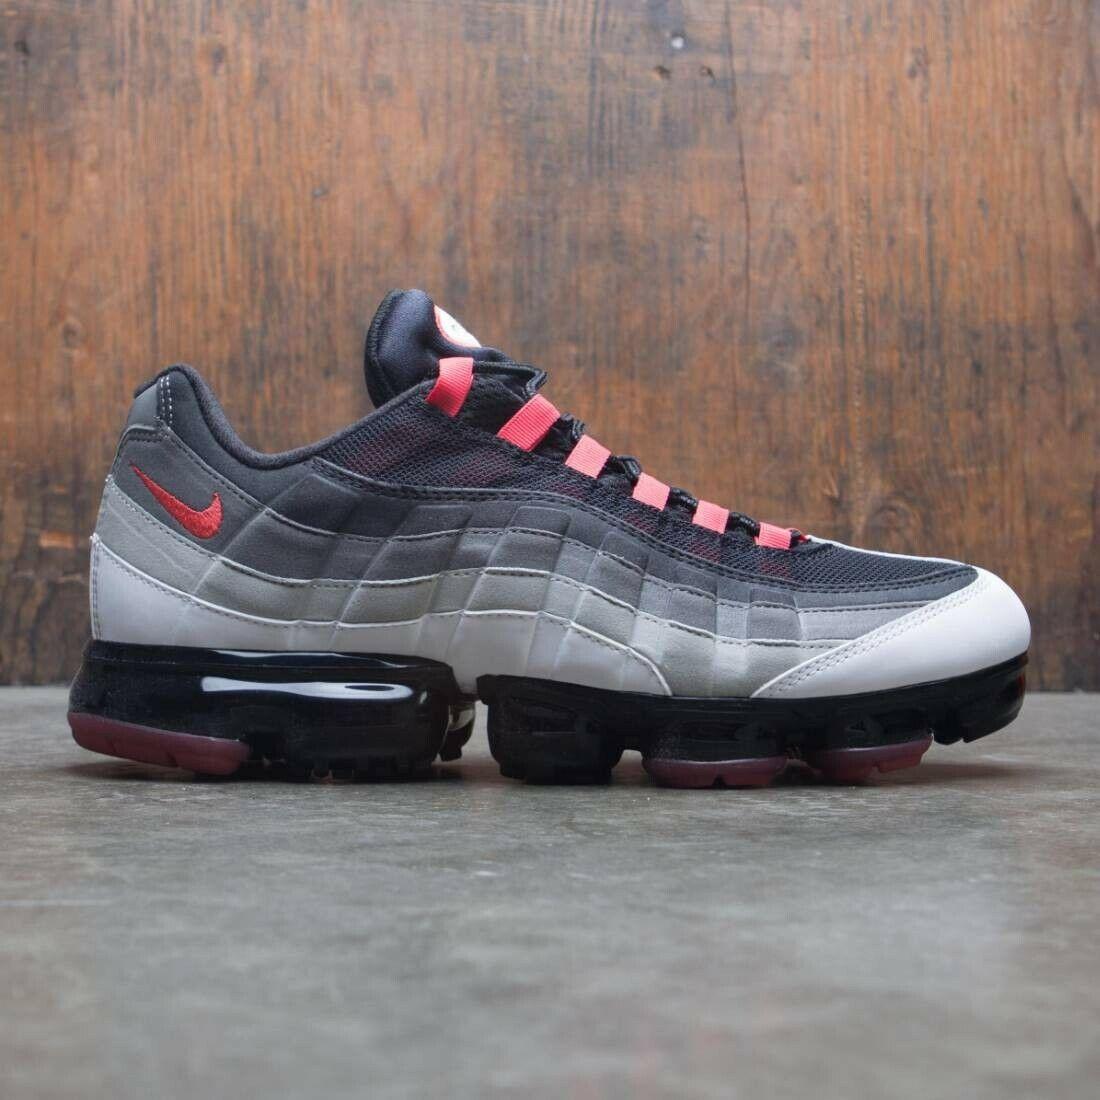 Nike Air Max Vapormax 95 OG Black Black Black Grey Red Size 10. AJ7292-101 1 97 98 7ddc48